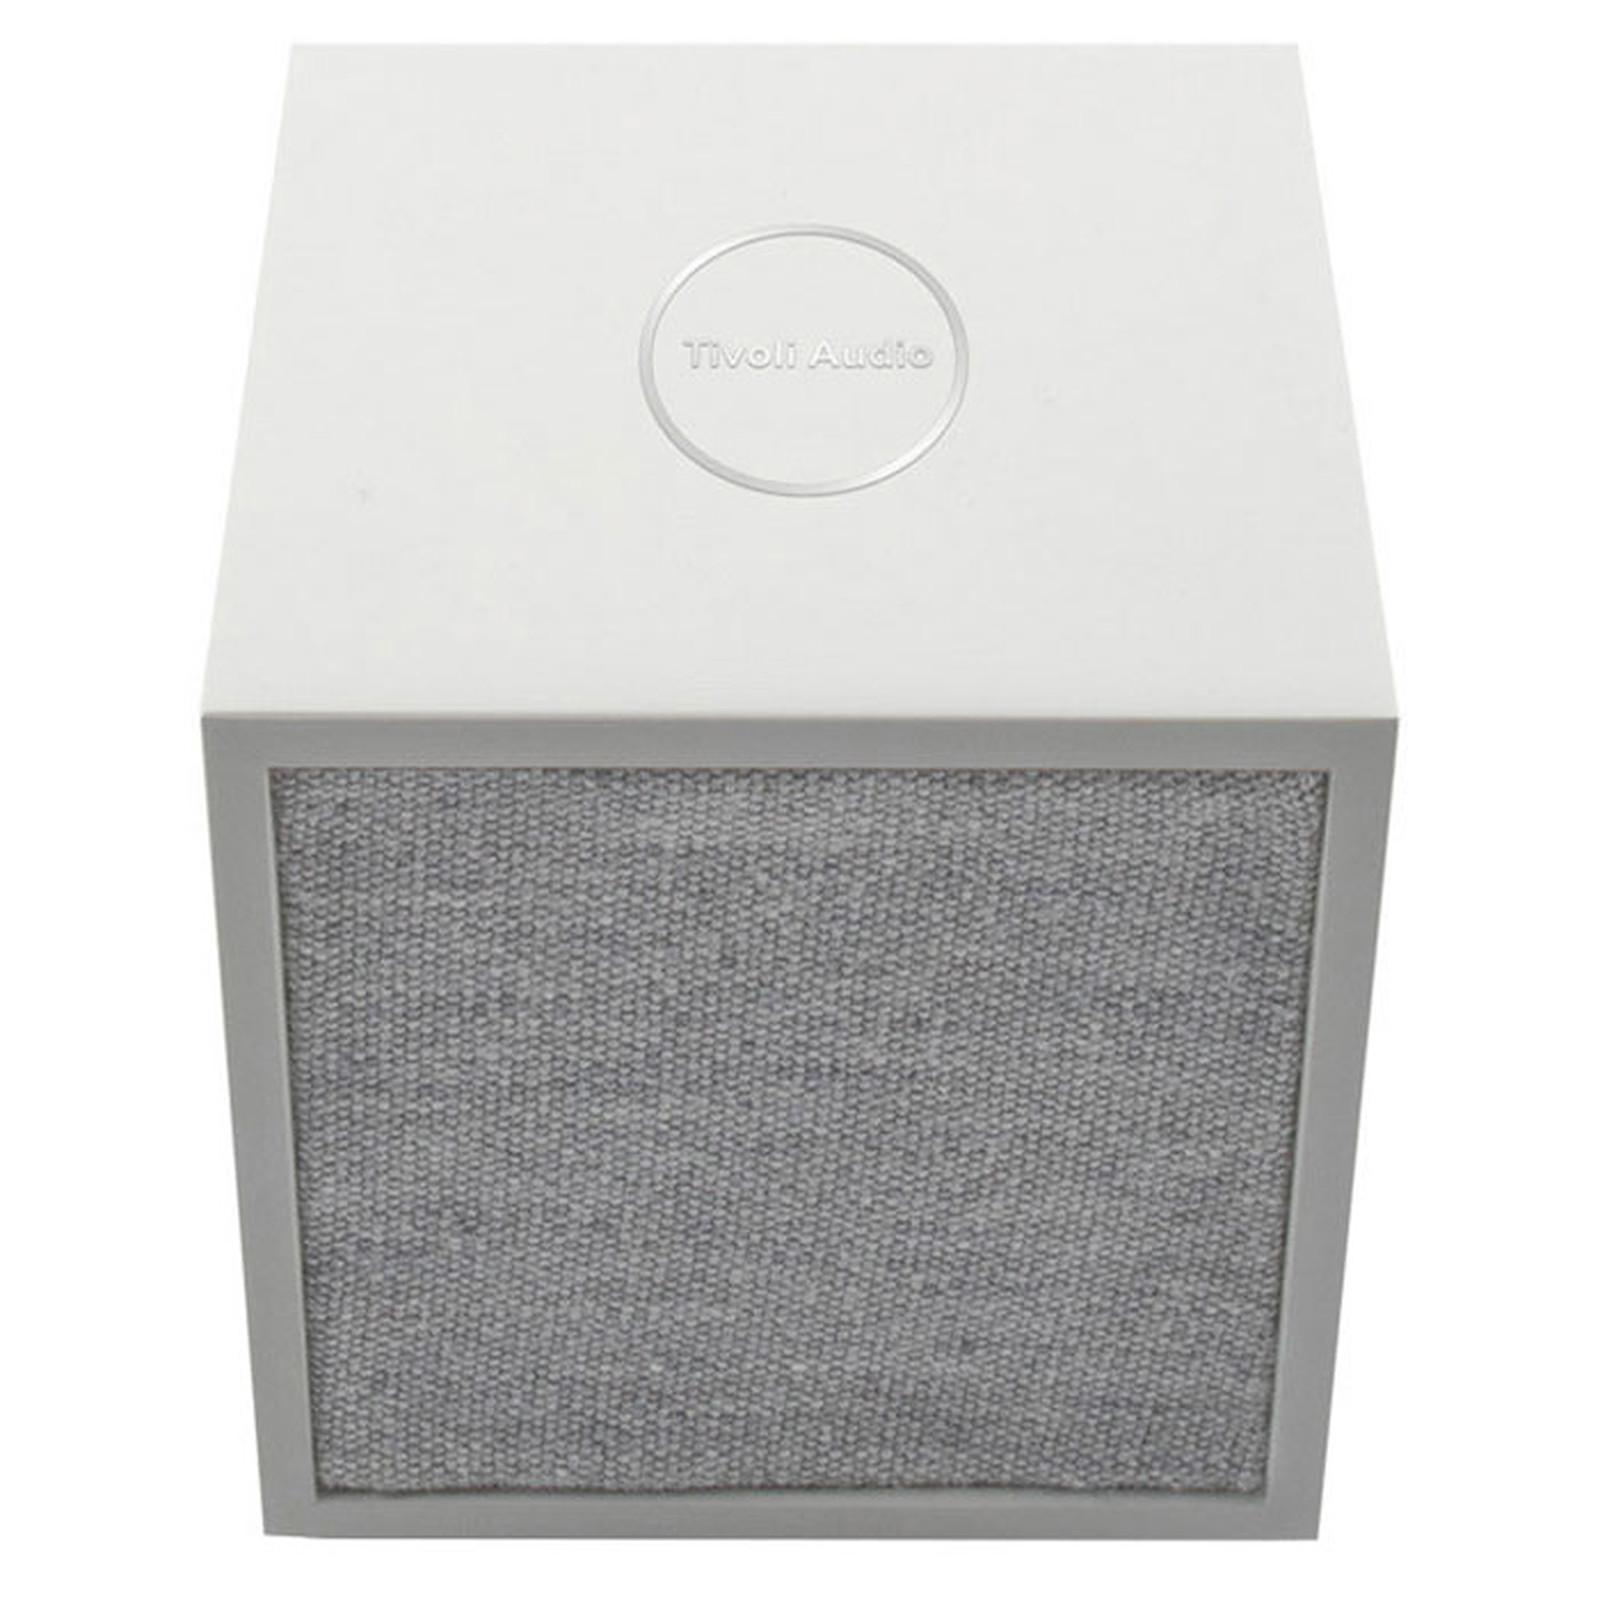 Tivoli Audio Cube Blanc / Gris